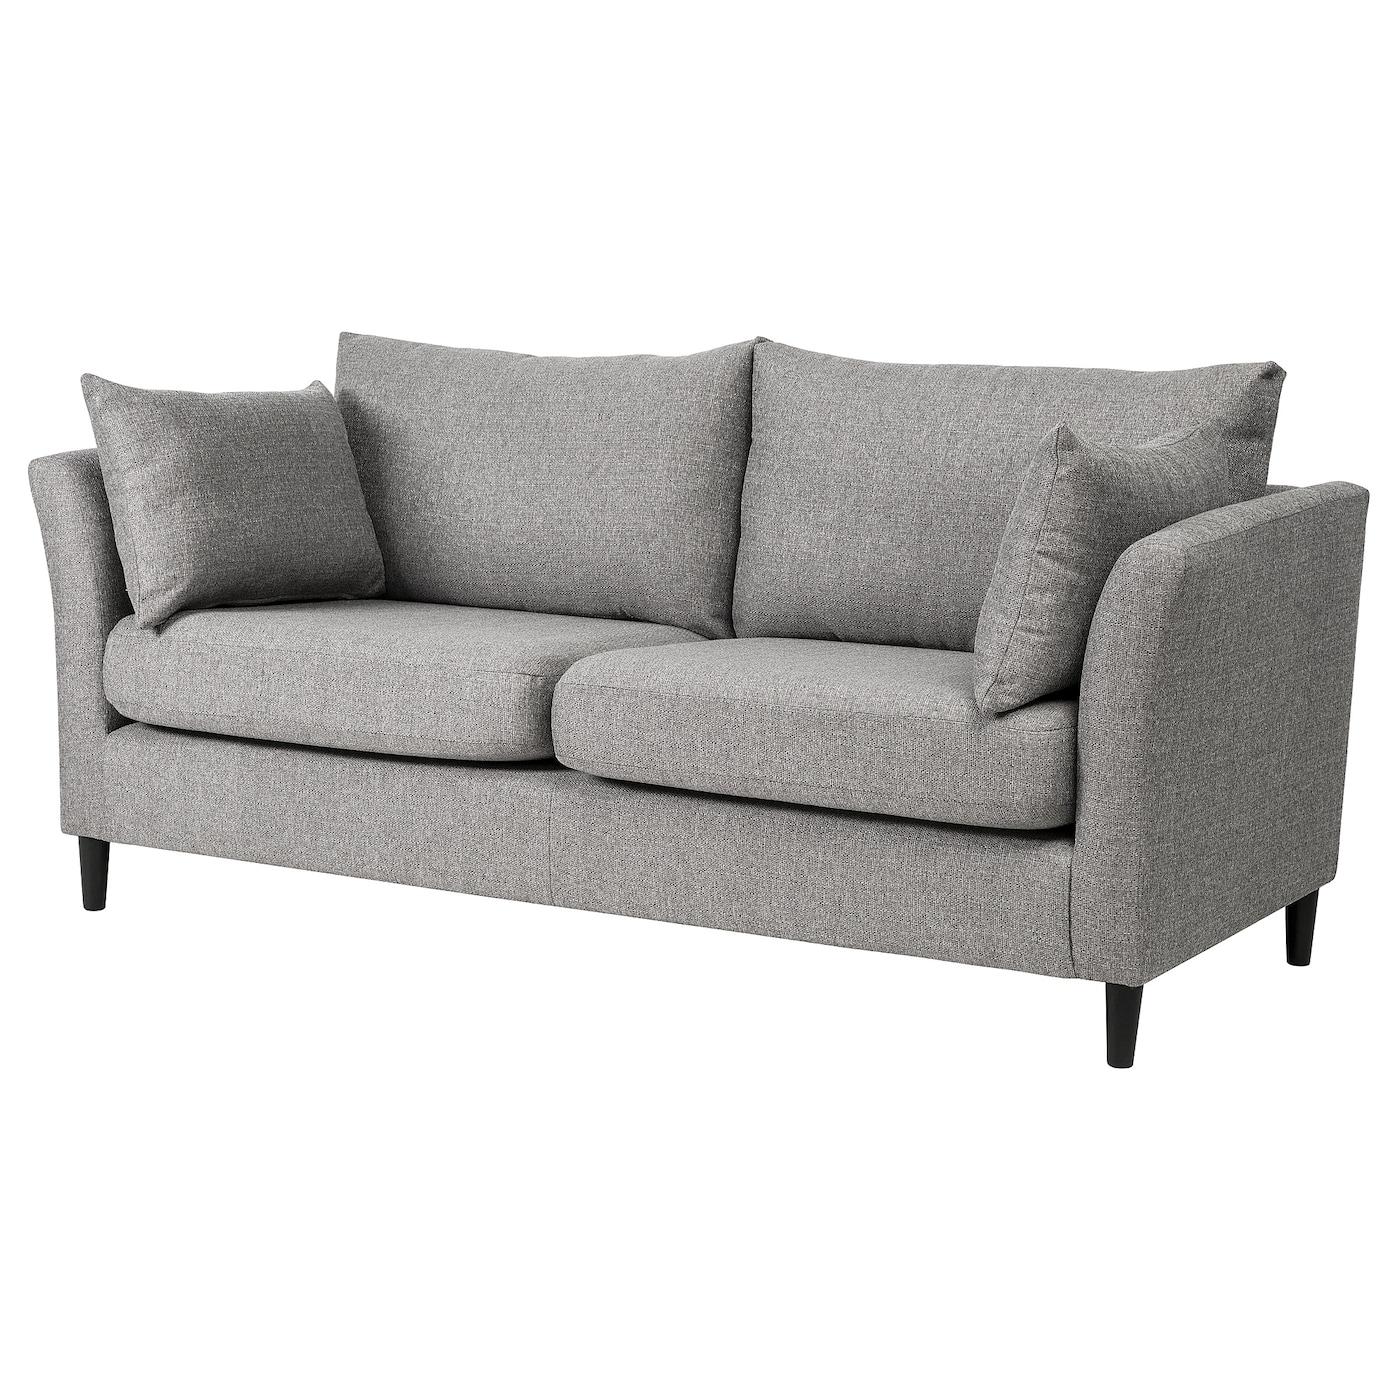 Ikea Bankeryd 3 Seat Sofa